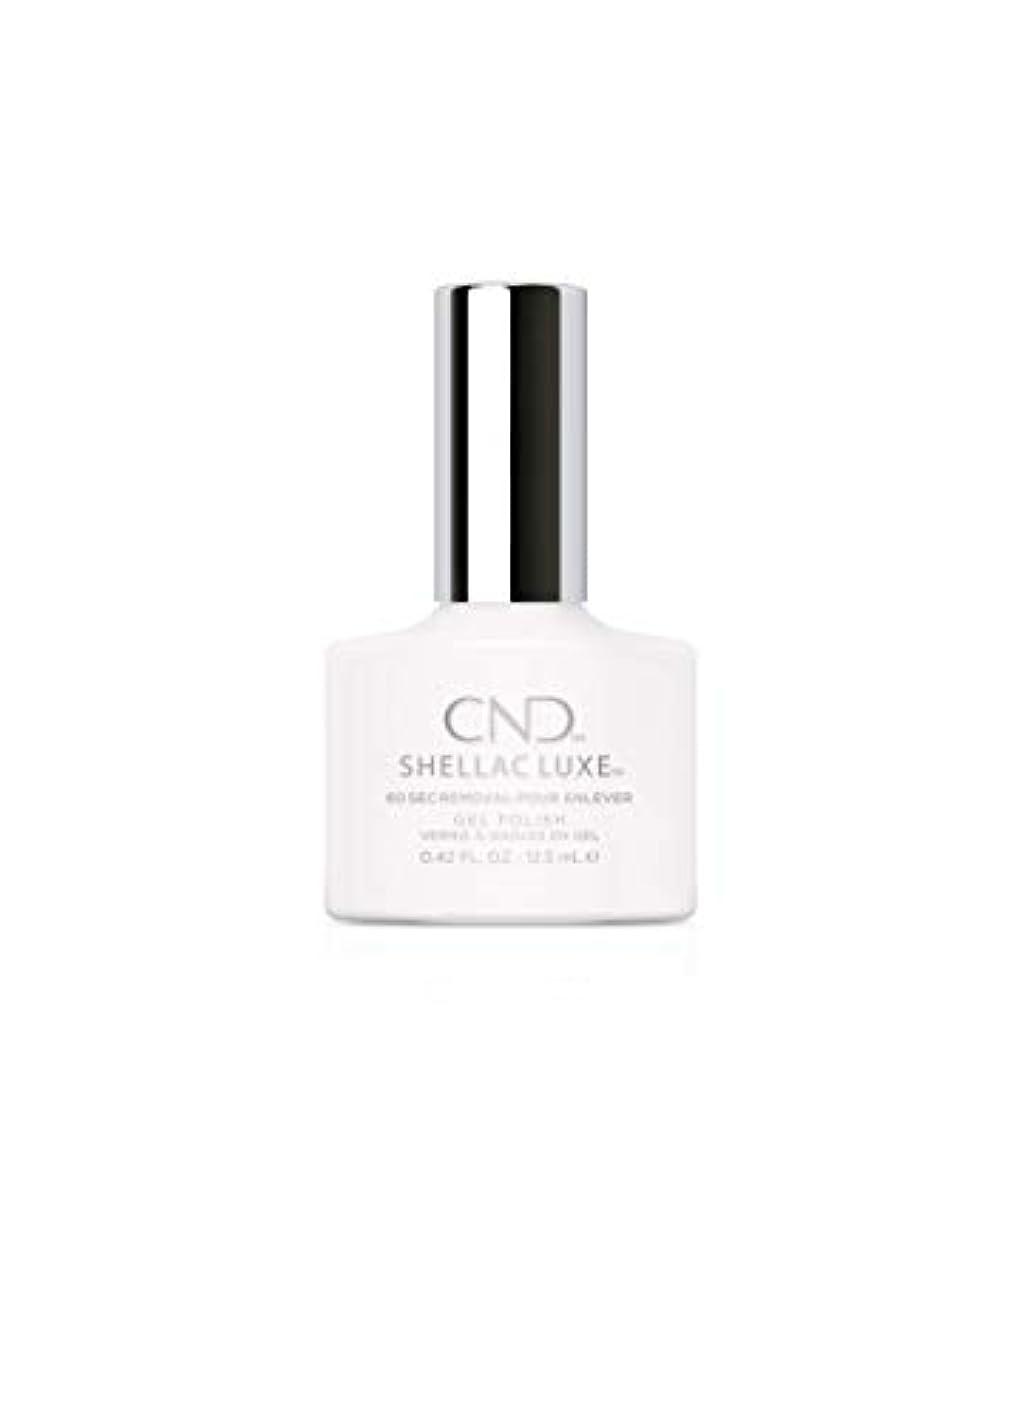 感情分離六月CND Shellac Luxe - Cream Puff - 12.5 ml / 0.42 oz